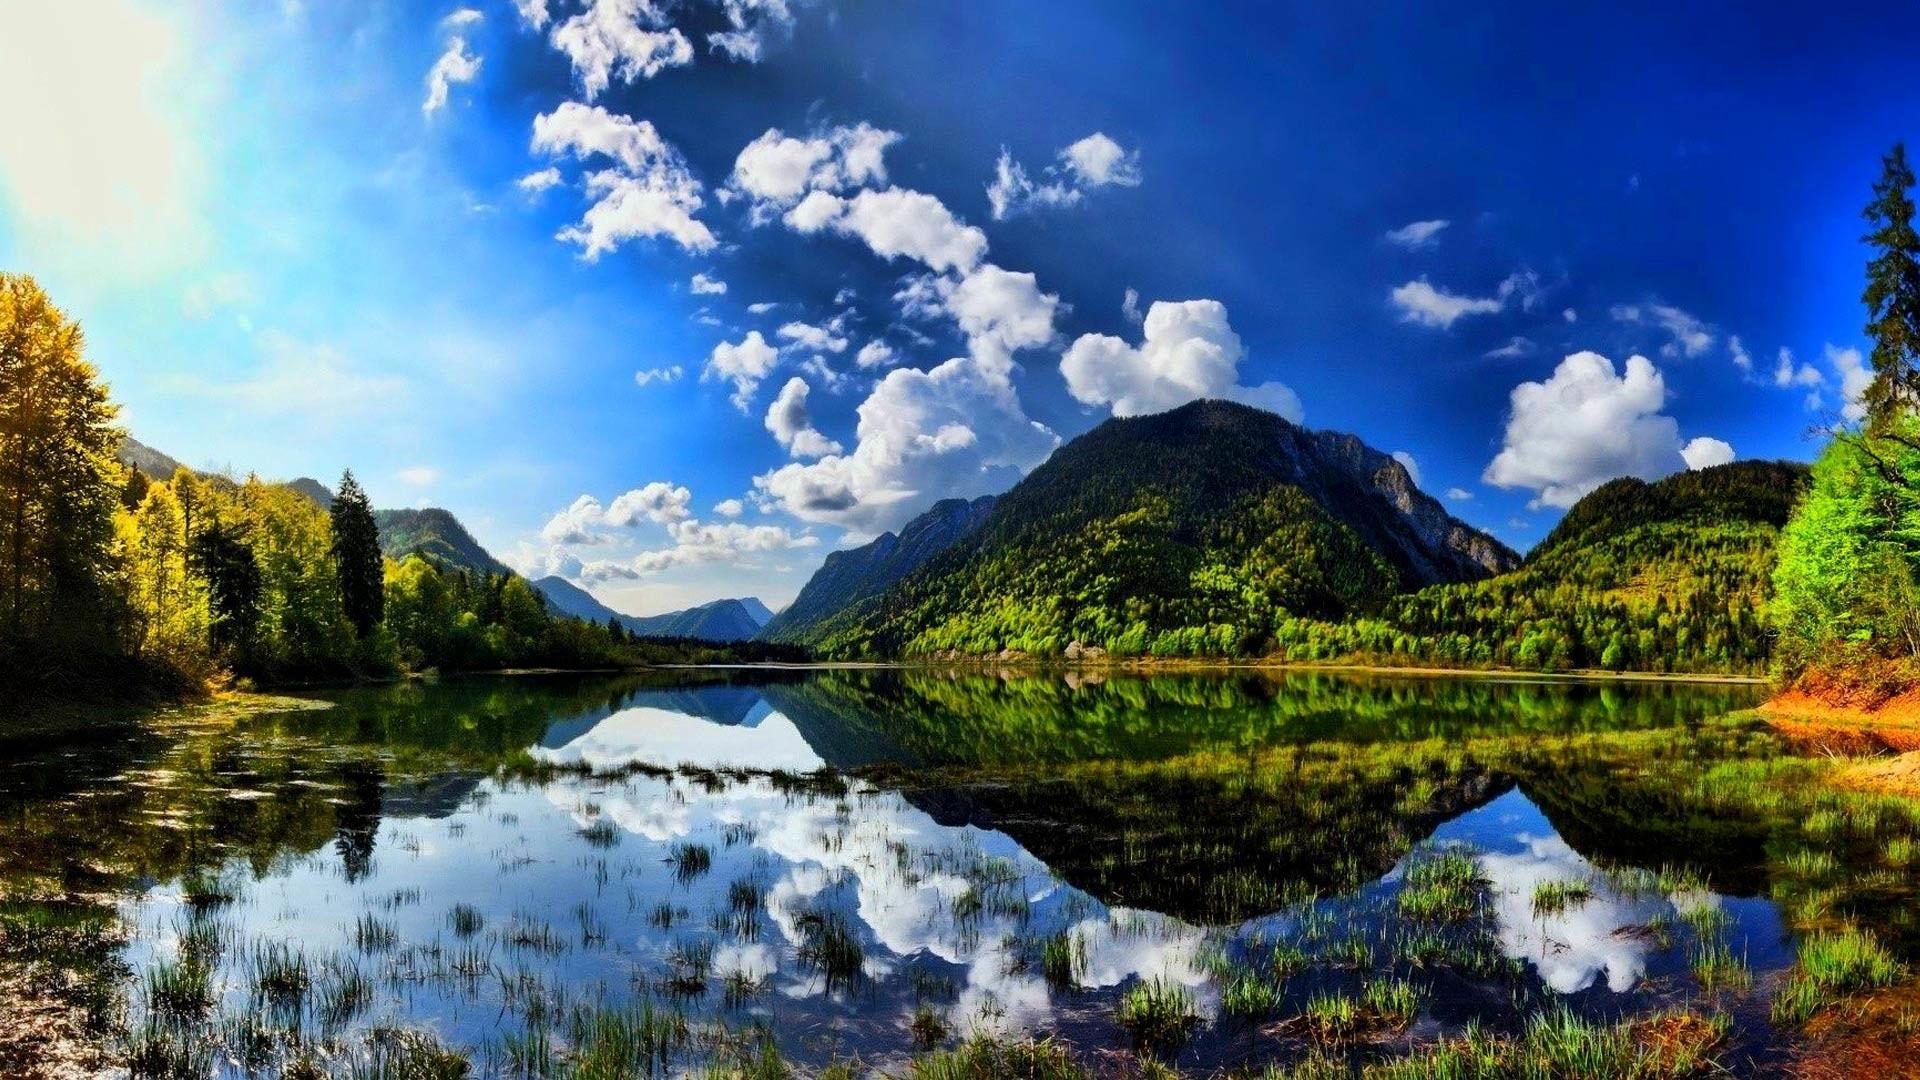 sunshine scenes lake mountain wallpapers – Free full hd wallpapers .